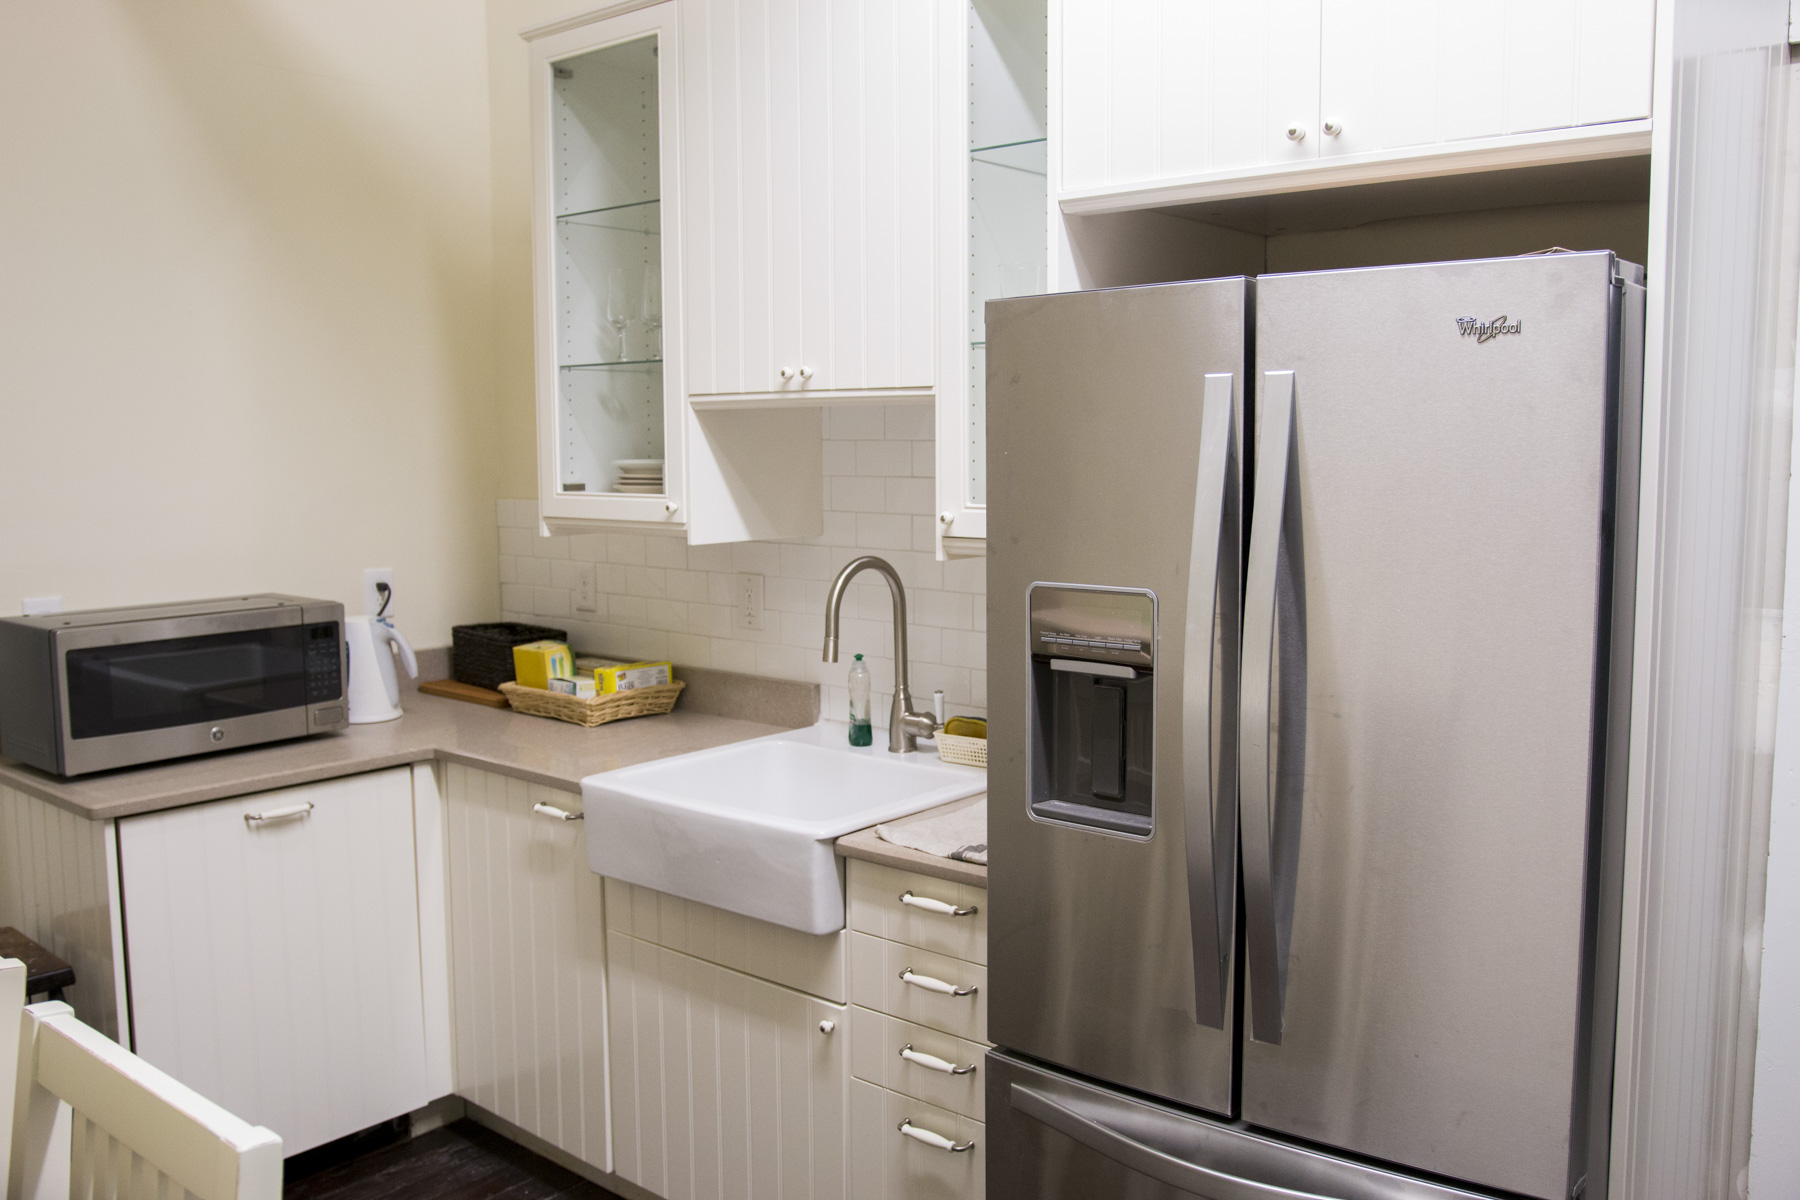 New Upstairs Kitchen